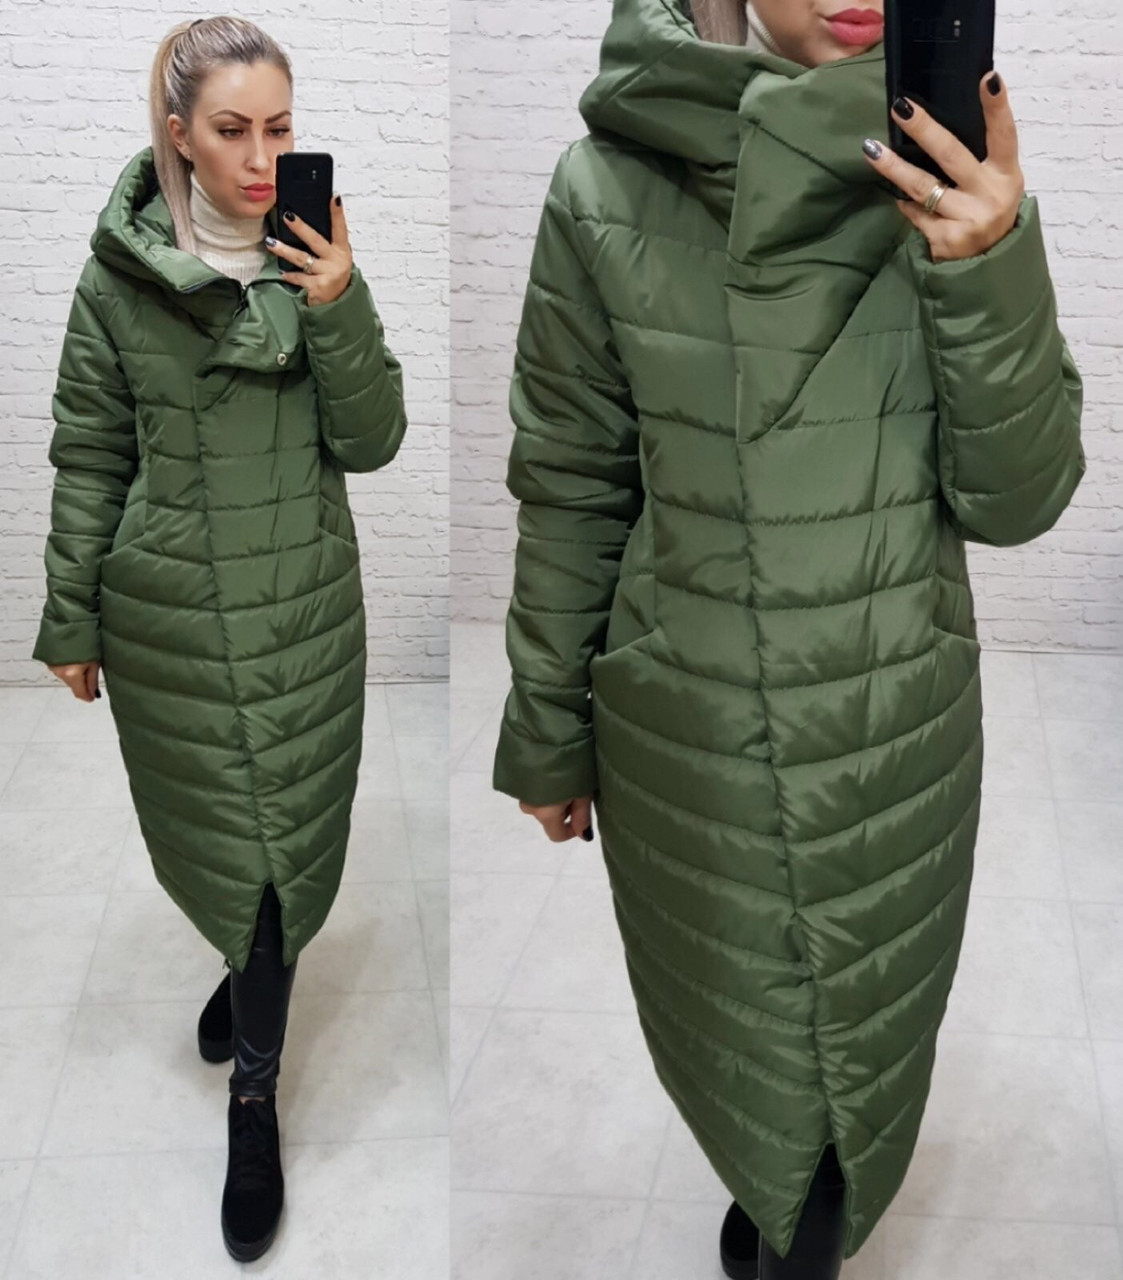 Куртка женская Осень  - Зима 42, 44, 46, 48, 50, 52, 54, 10 расцветок